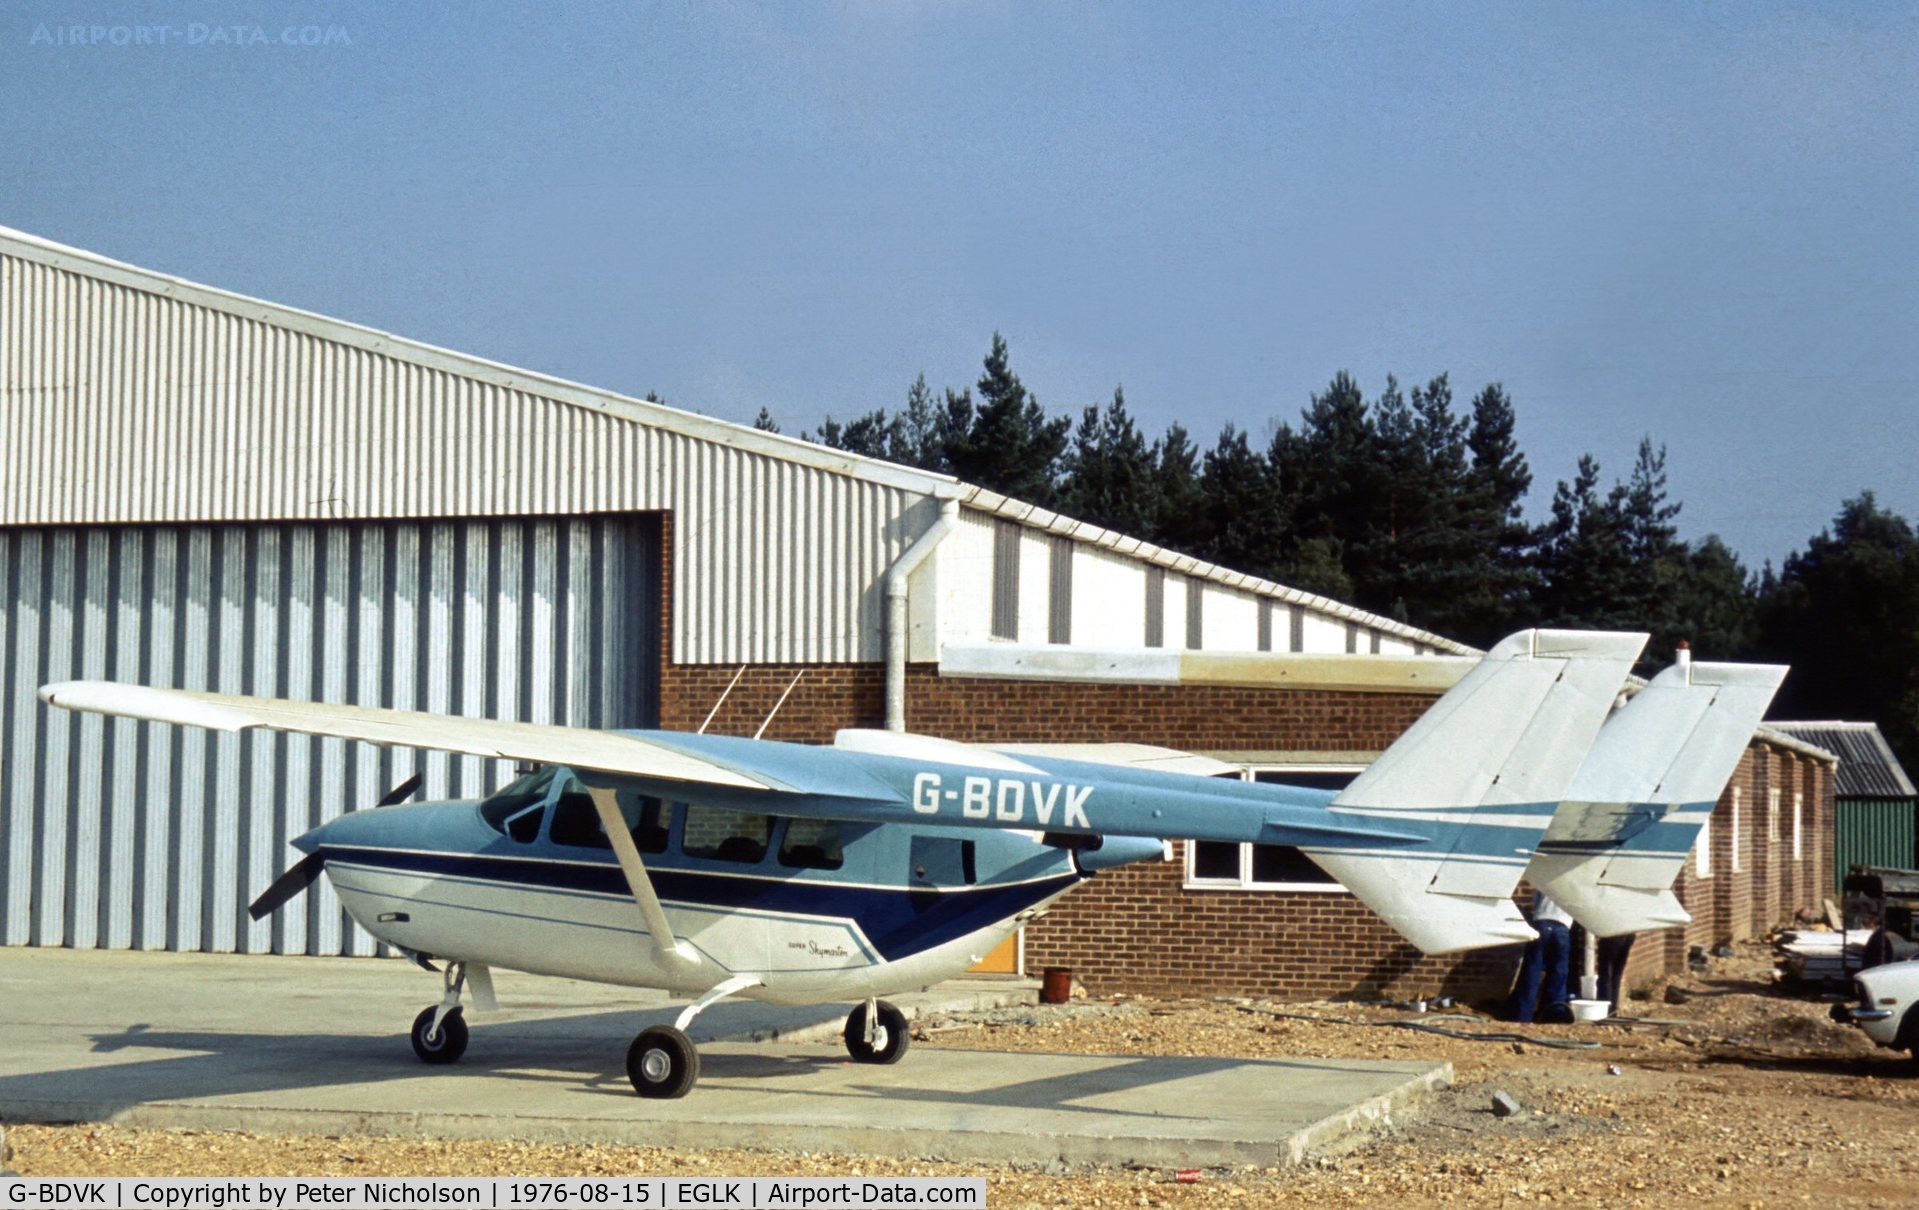 Aircraft G-BDVK (1971 Reims F337F Super Skymaster C/N F3370031